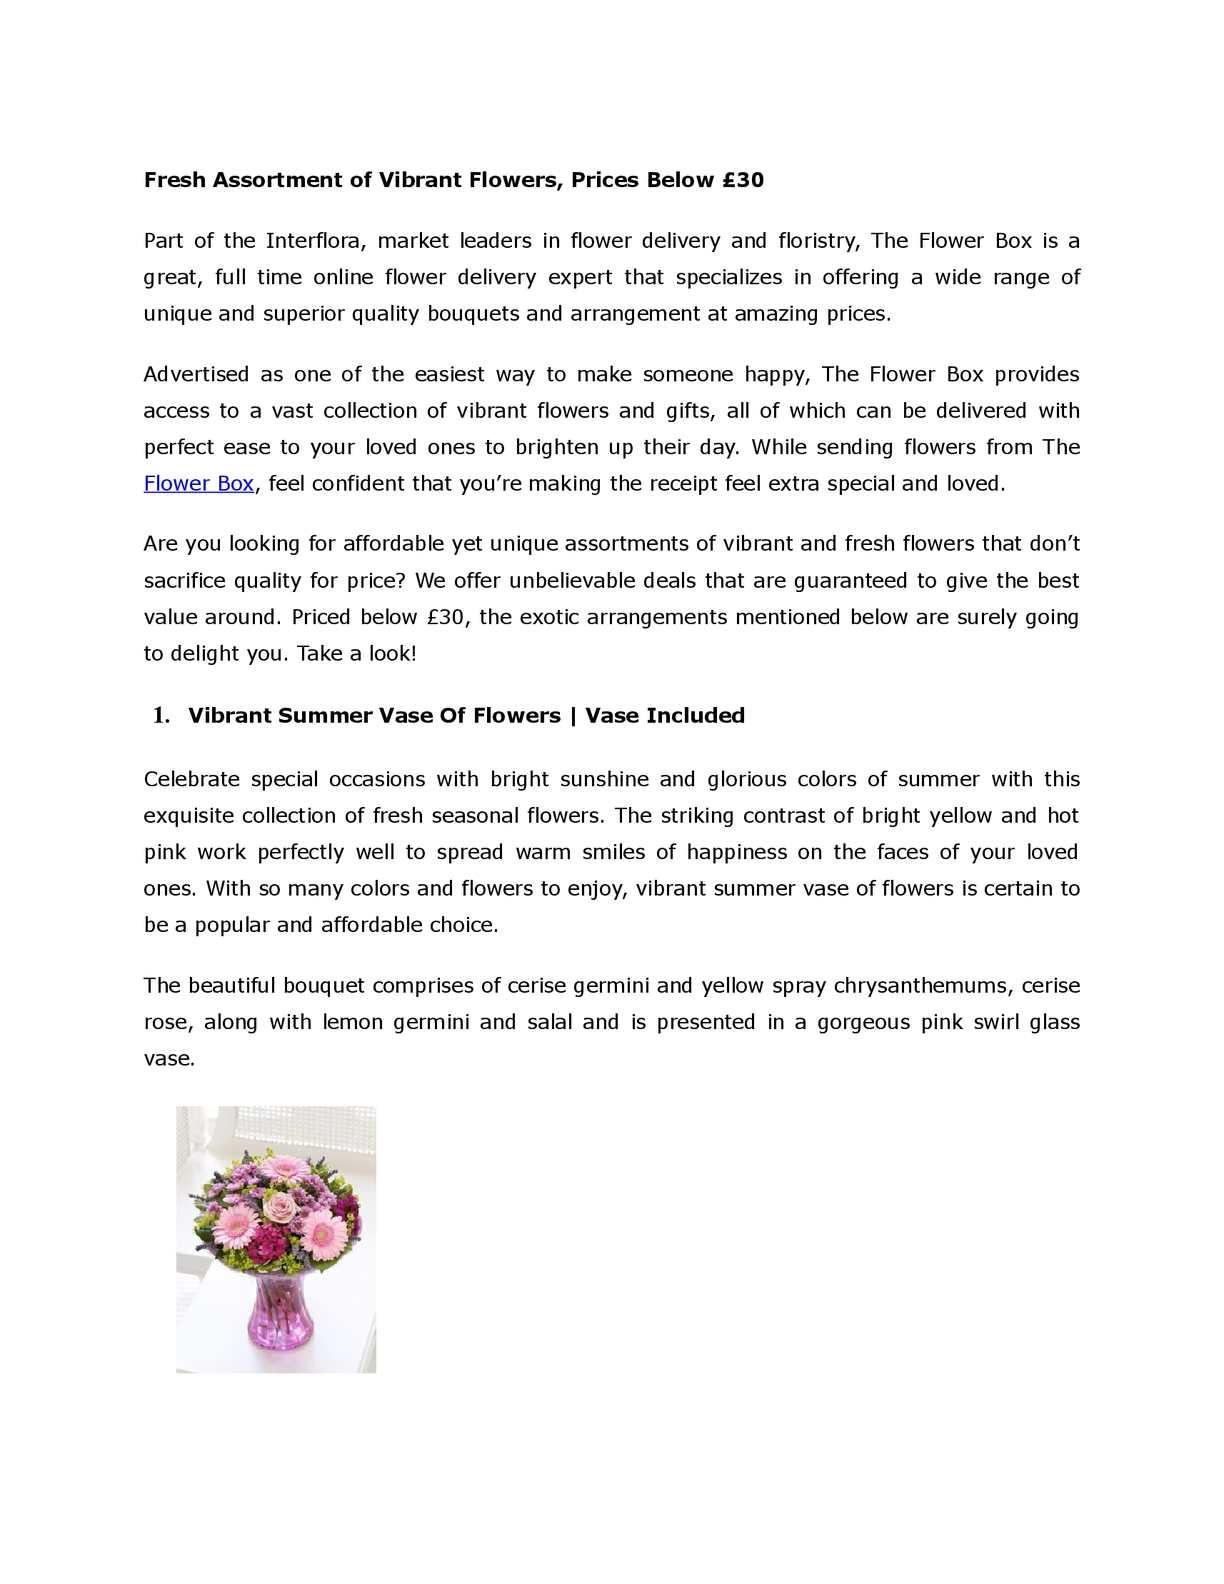 Calameo Fresh Assortment Of Vibrant Flowers Prices Below 30